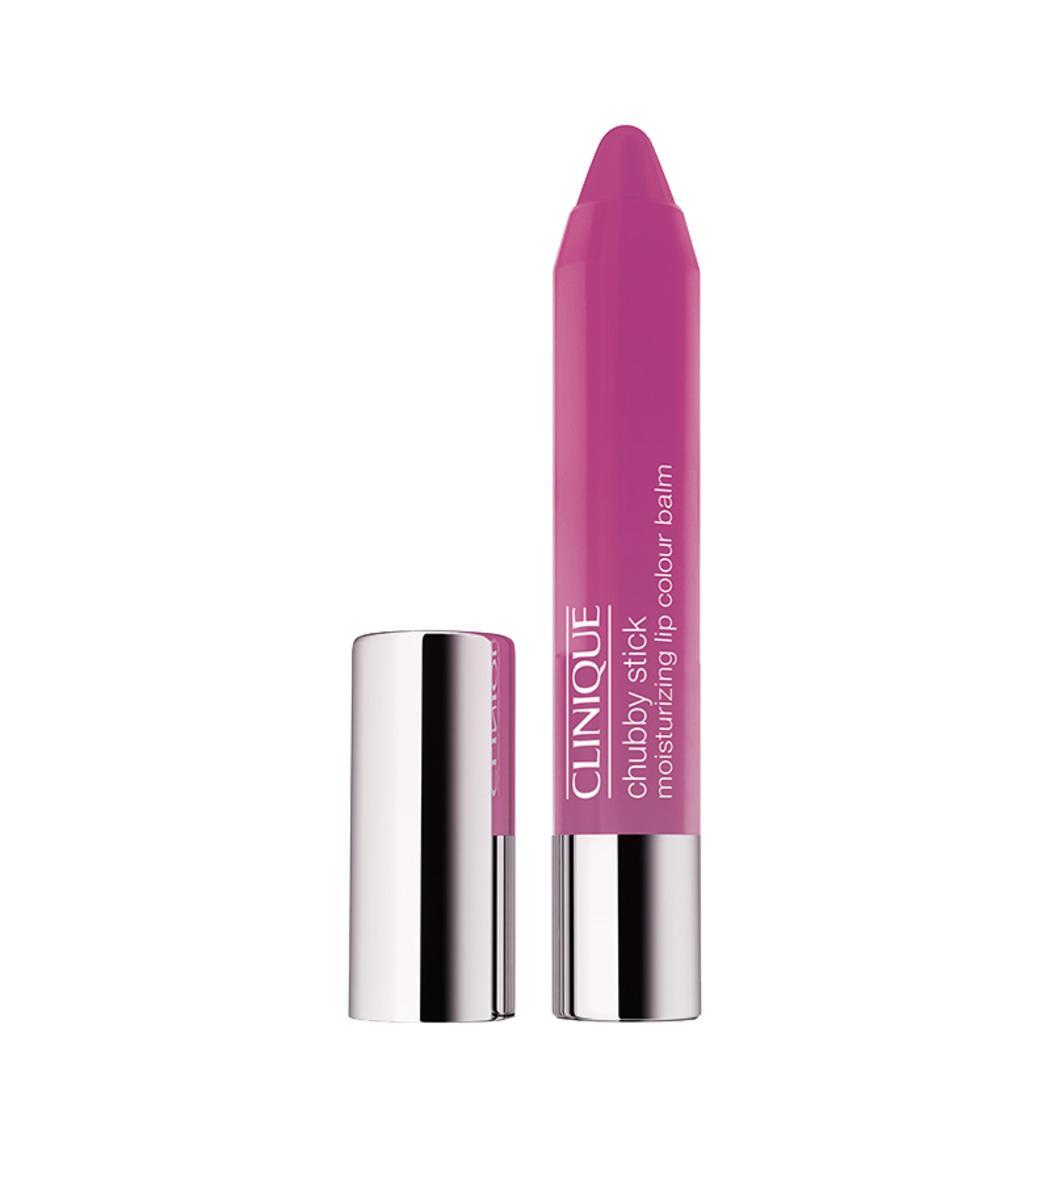 Clinique Chubby Stick Lip Colour Balm - Pudgy Peony